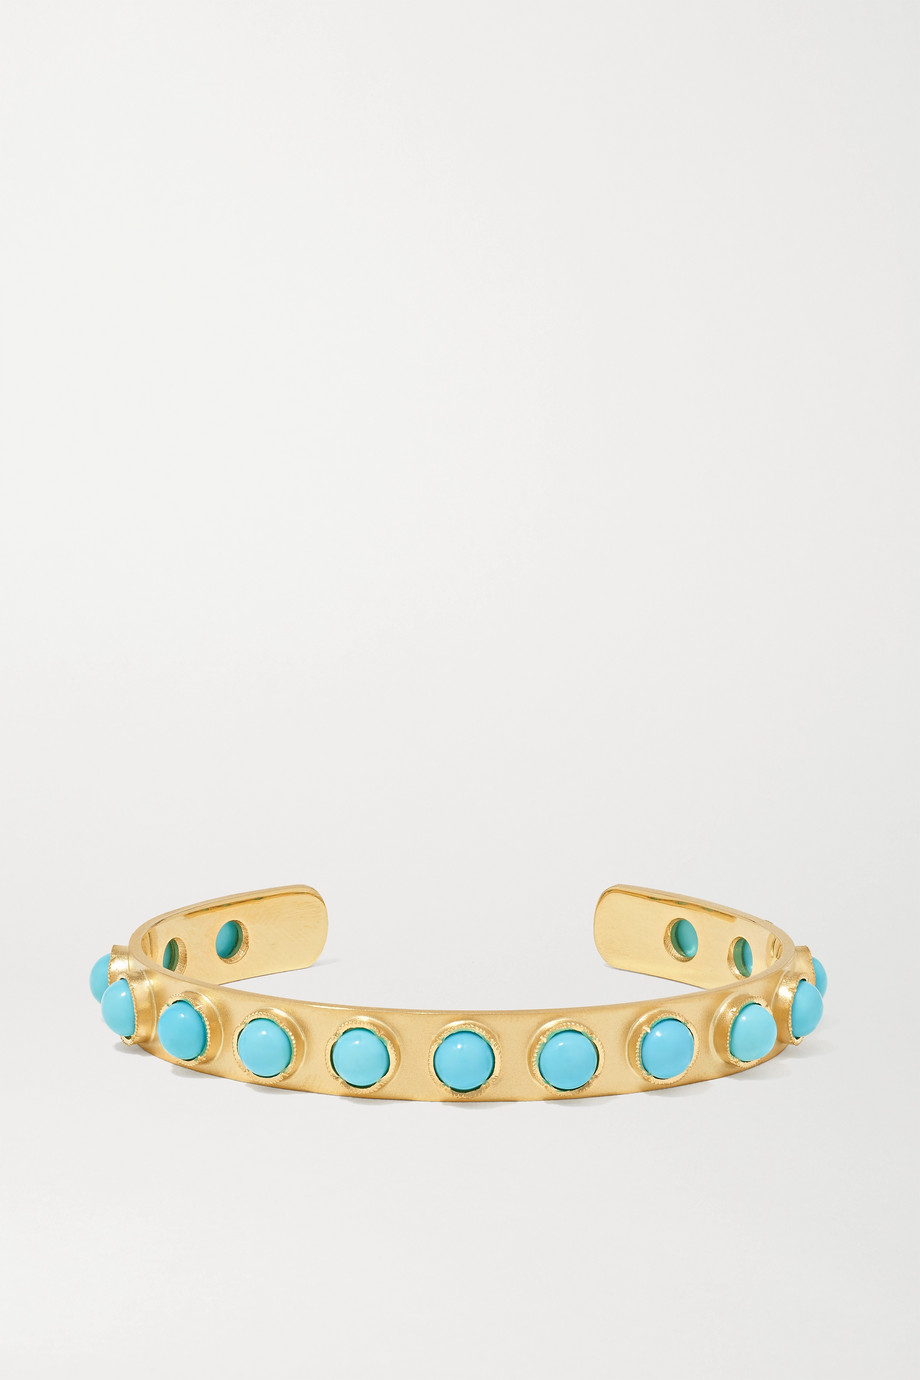 Irene Neuwirth Classic 18-karat gold turquoise cuff